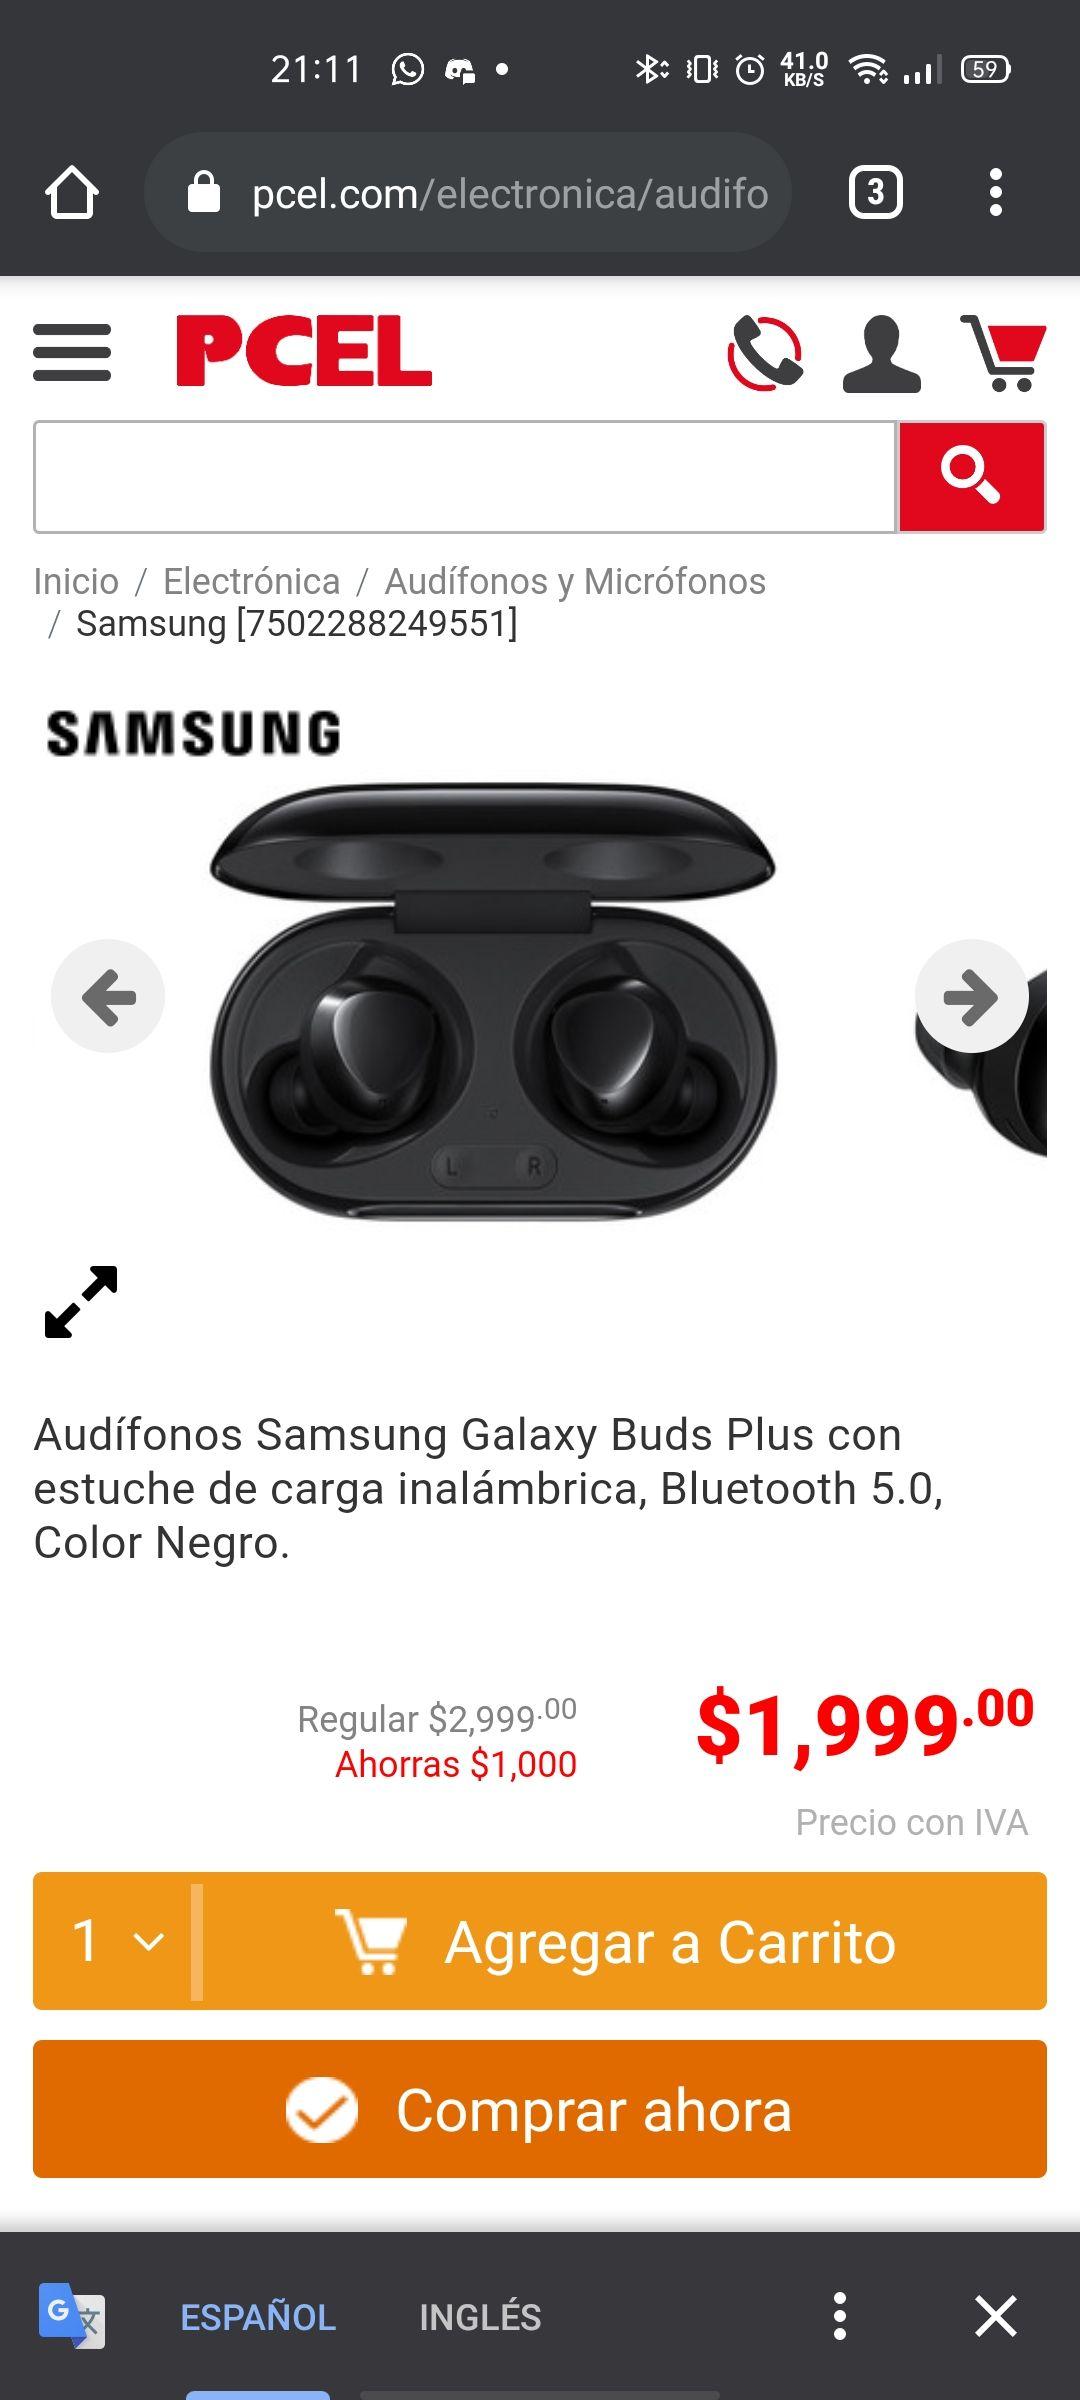 PCEL: Samsung Galaxy buds +